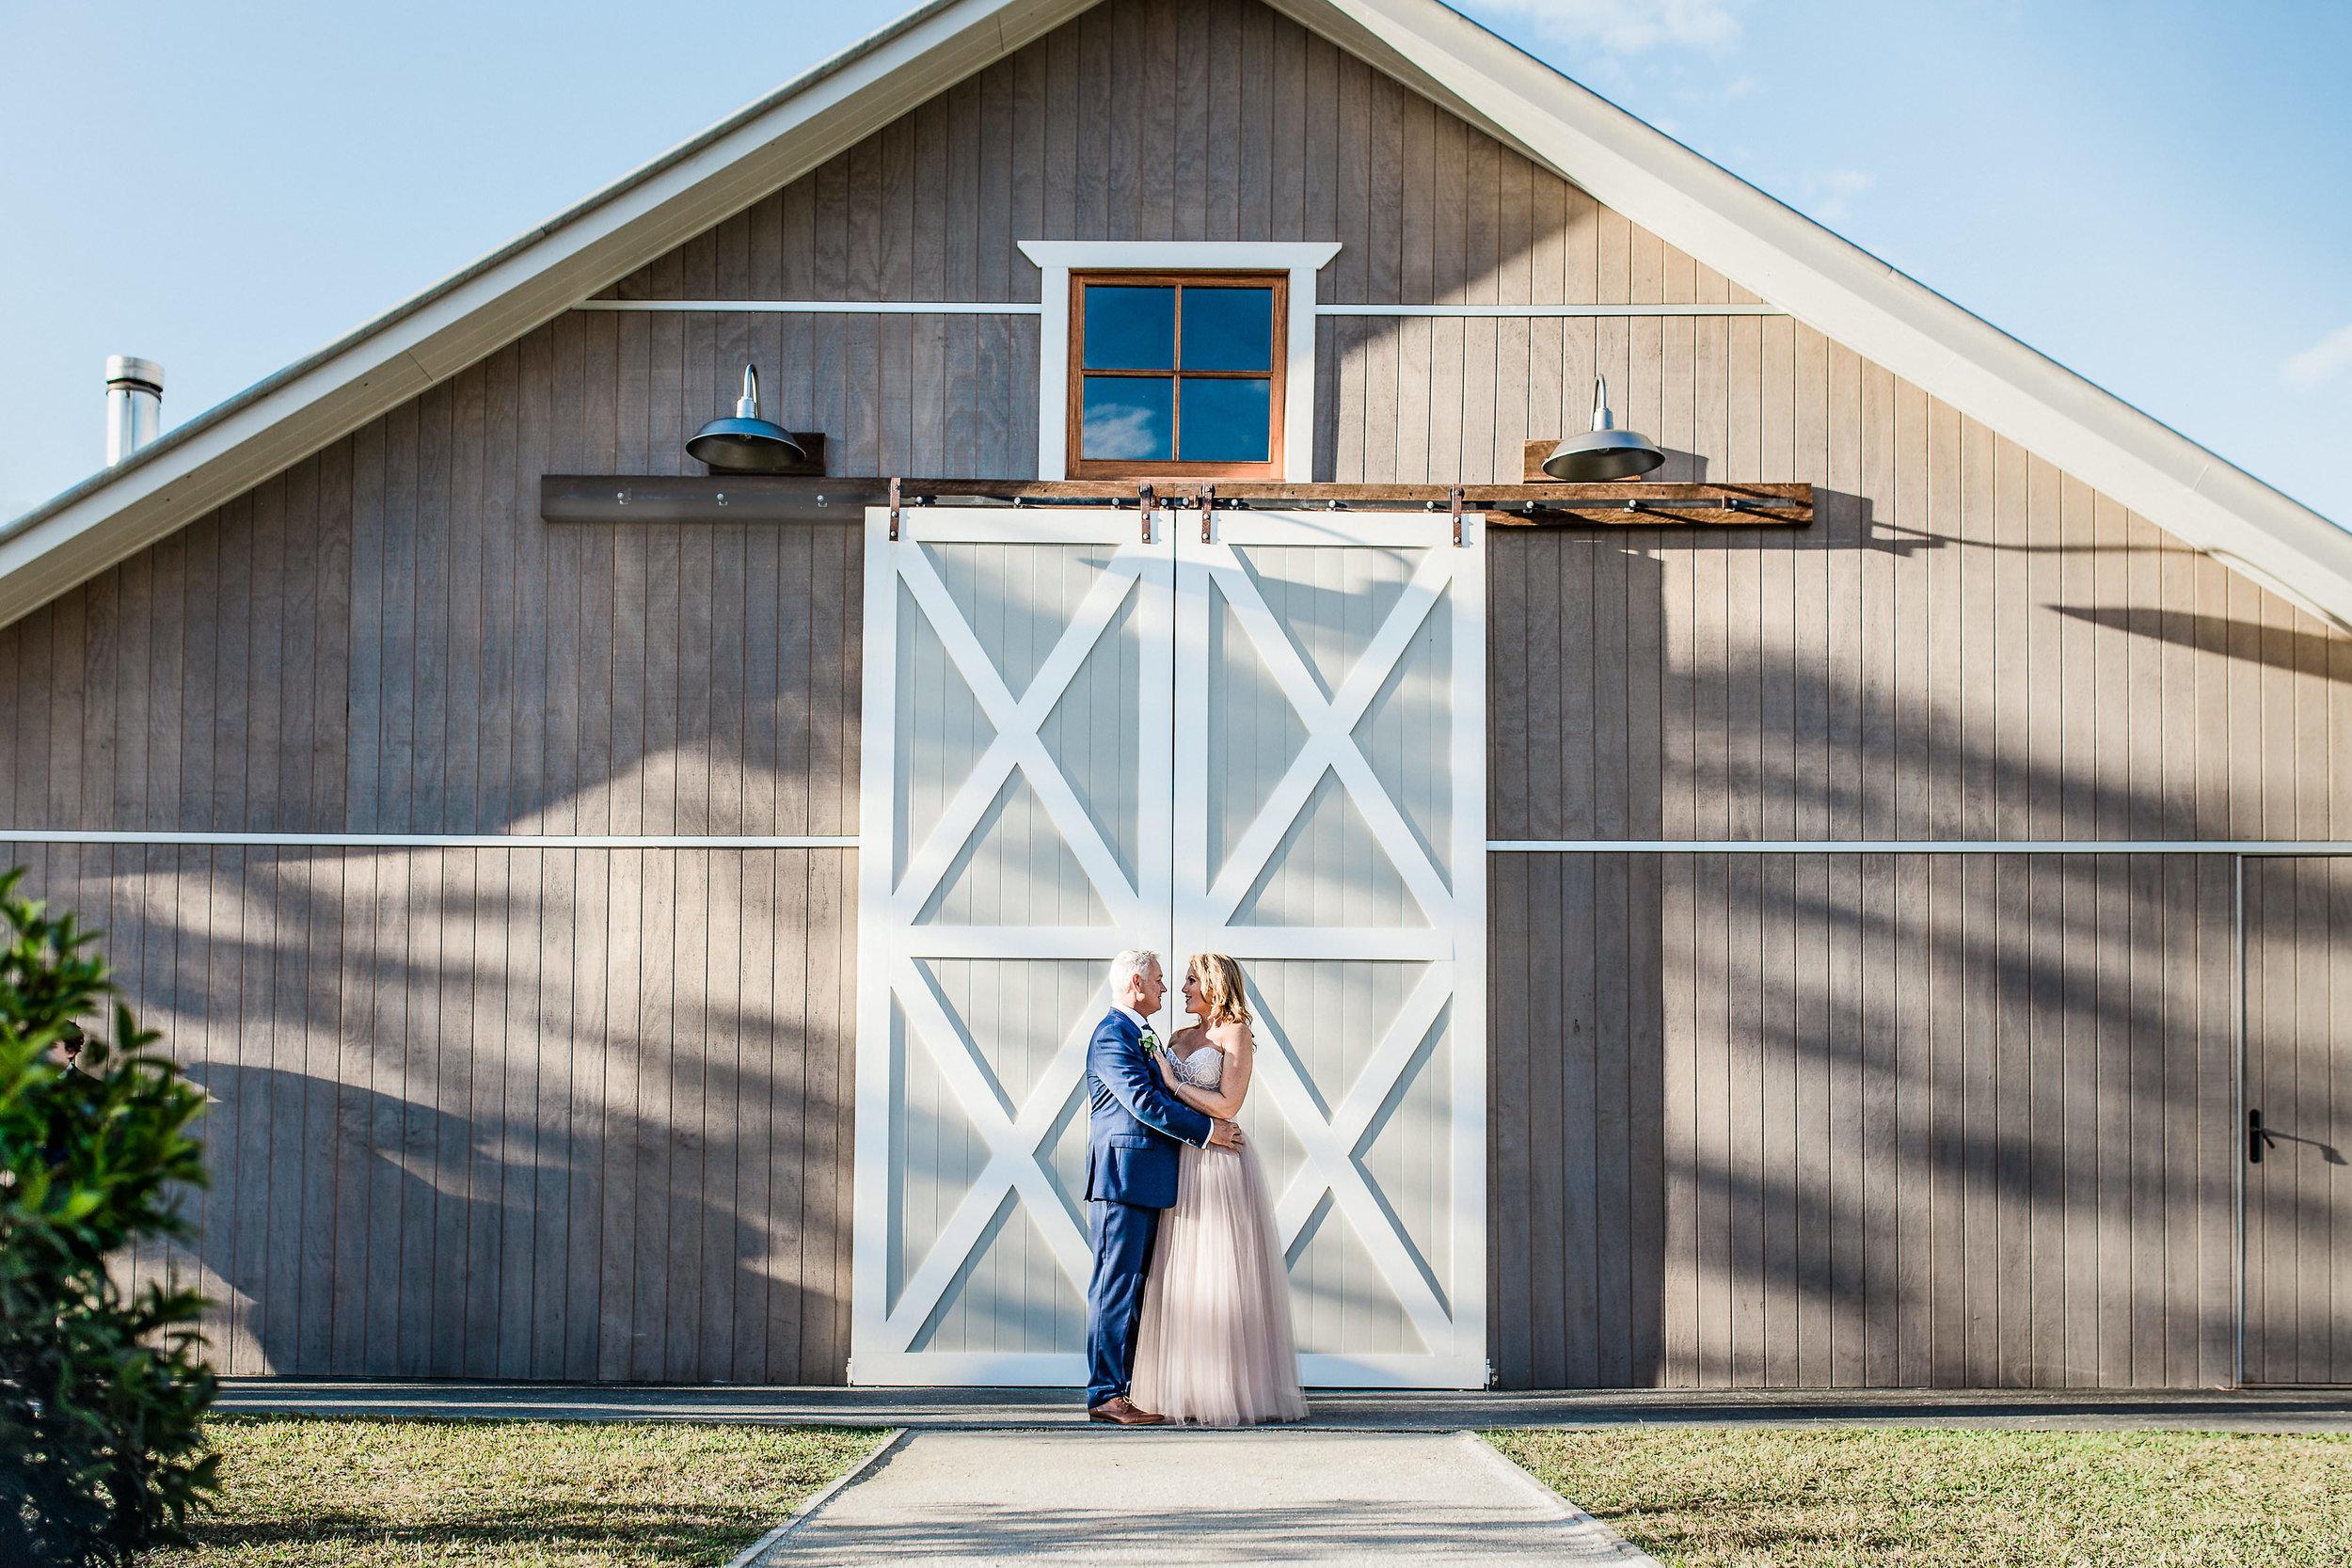 Gold_Coast_Hinterland_Barn_Wedding_Cowbell_Creek_True_North_Photography_janine_J+T-1.jpg